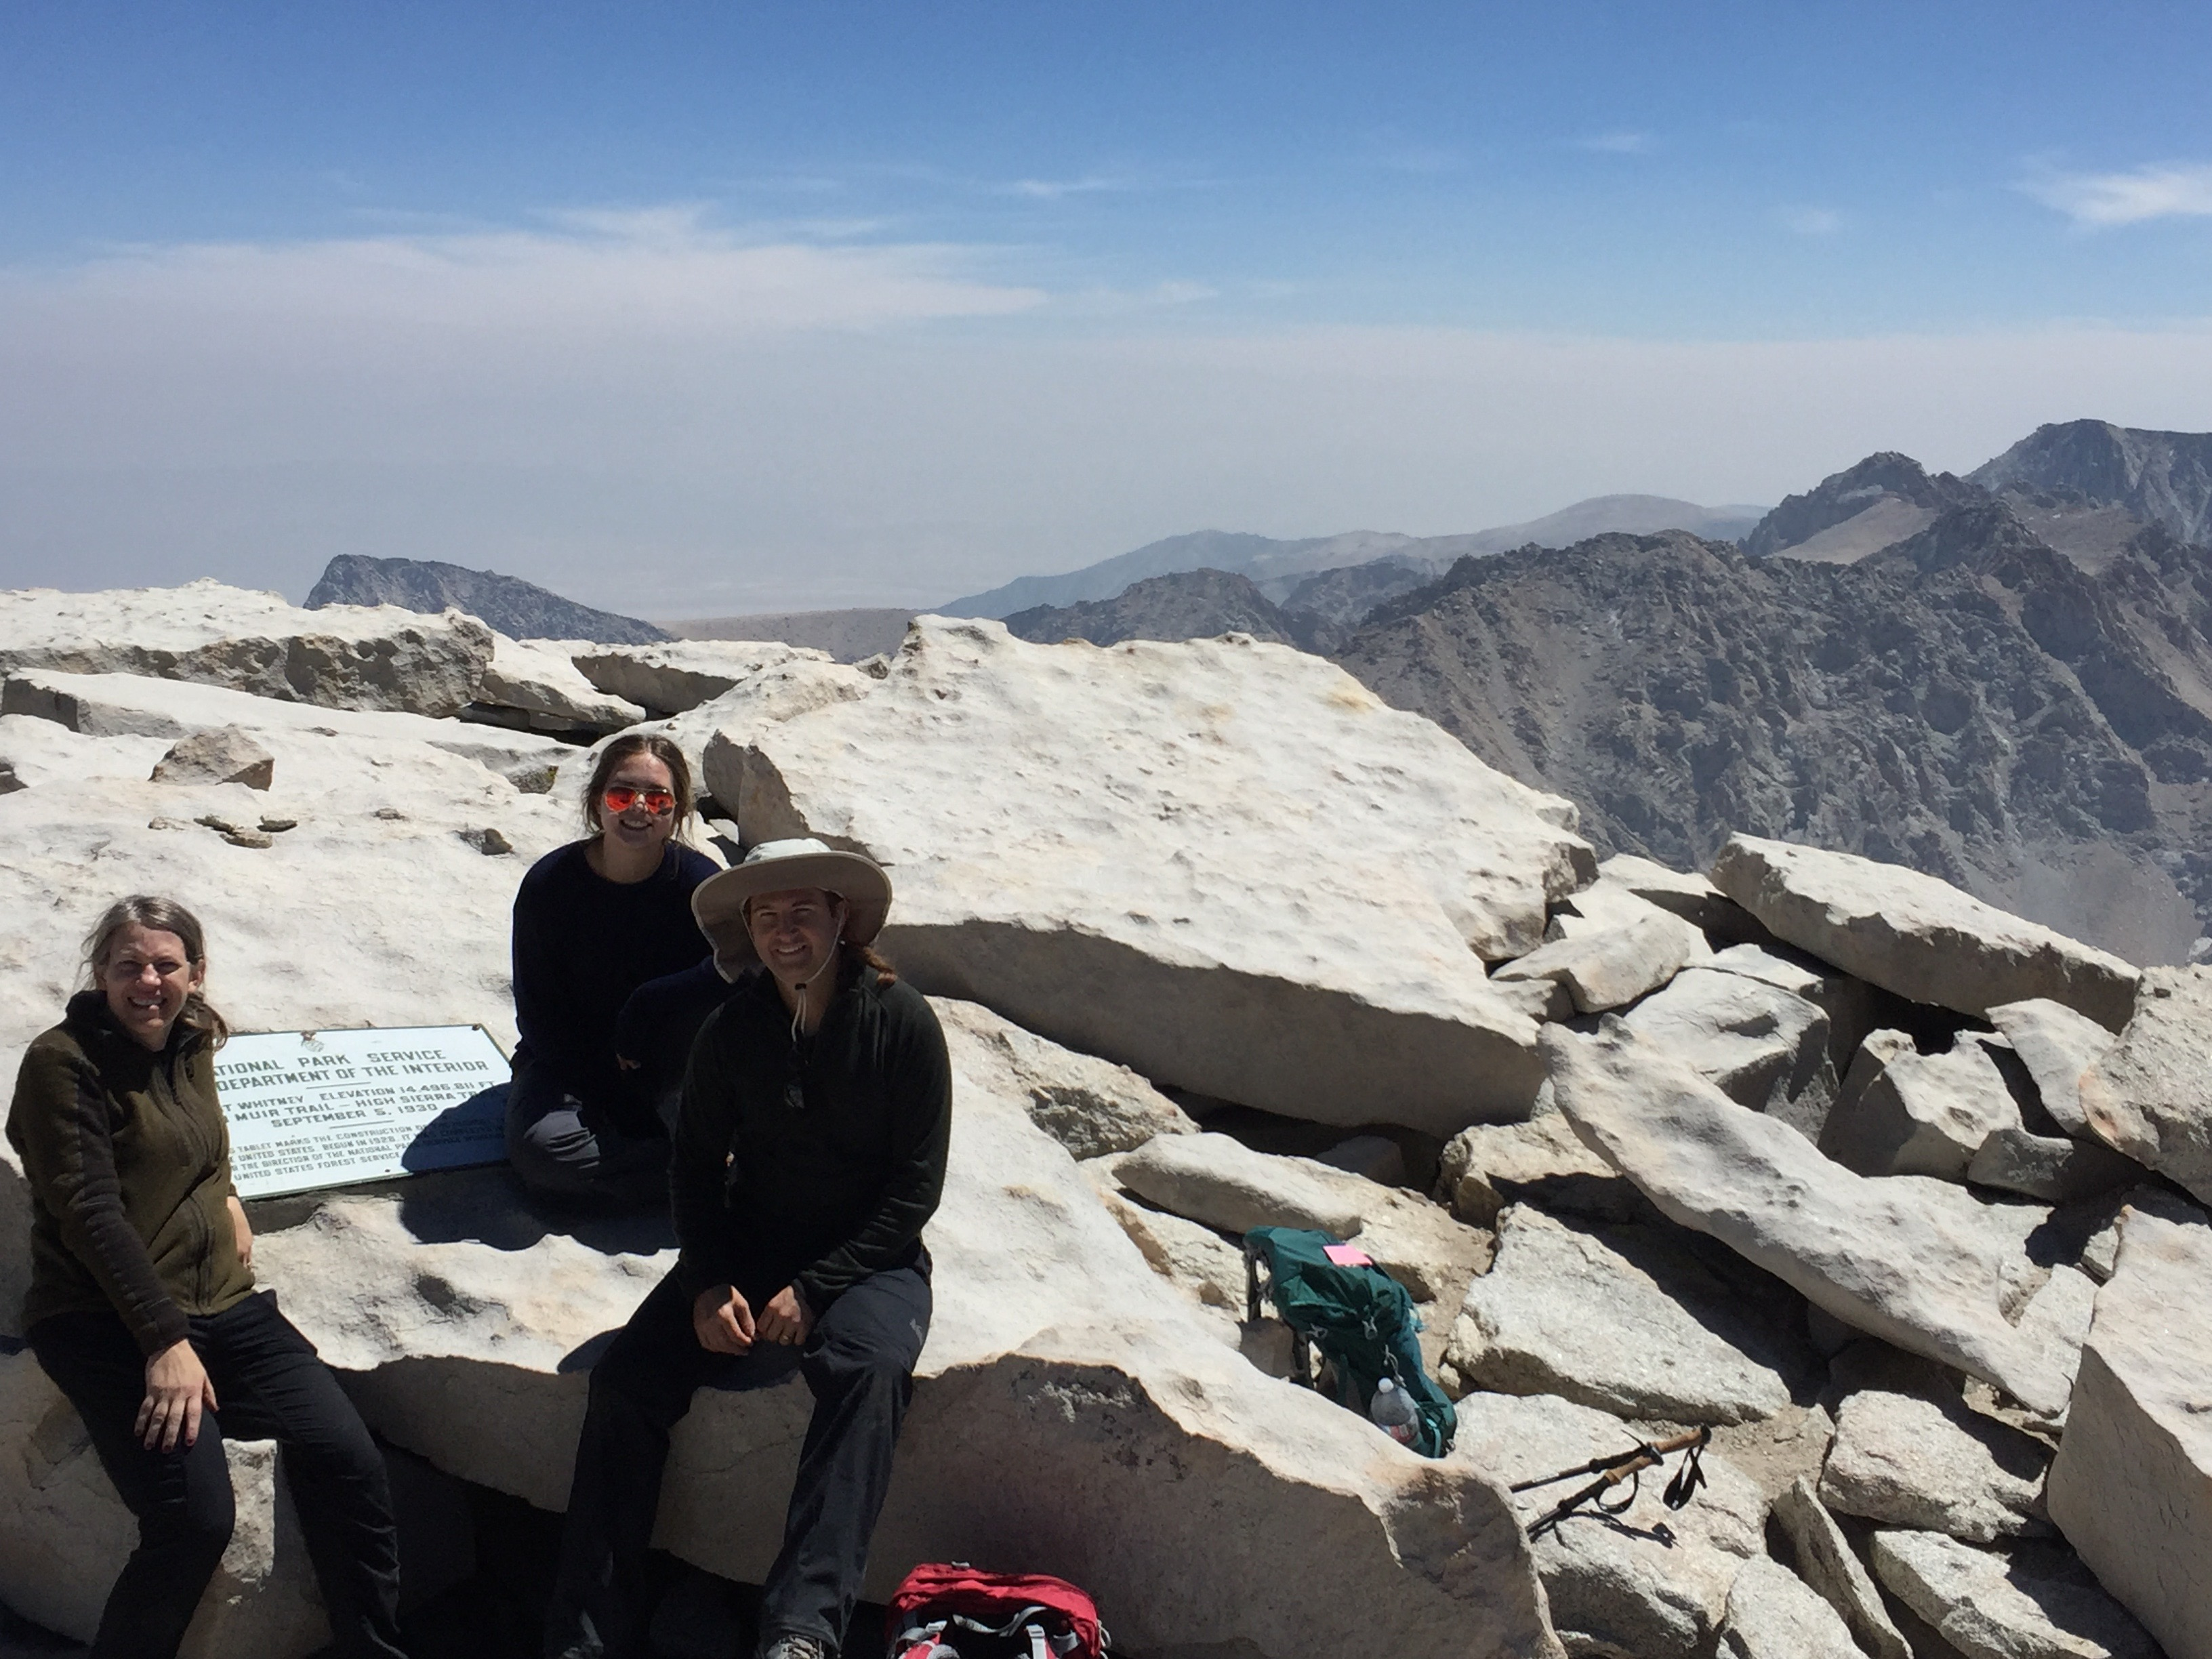 Mt. Whitney summit plaque